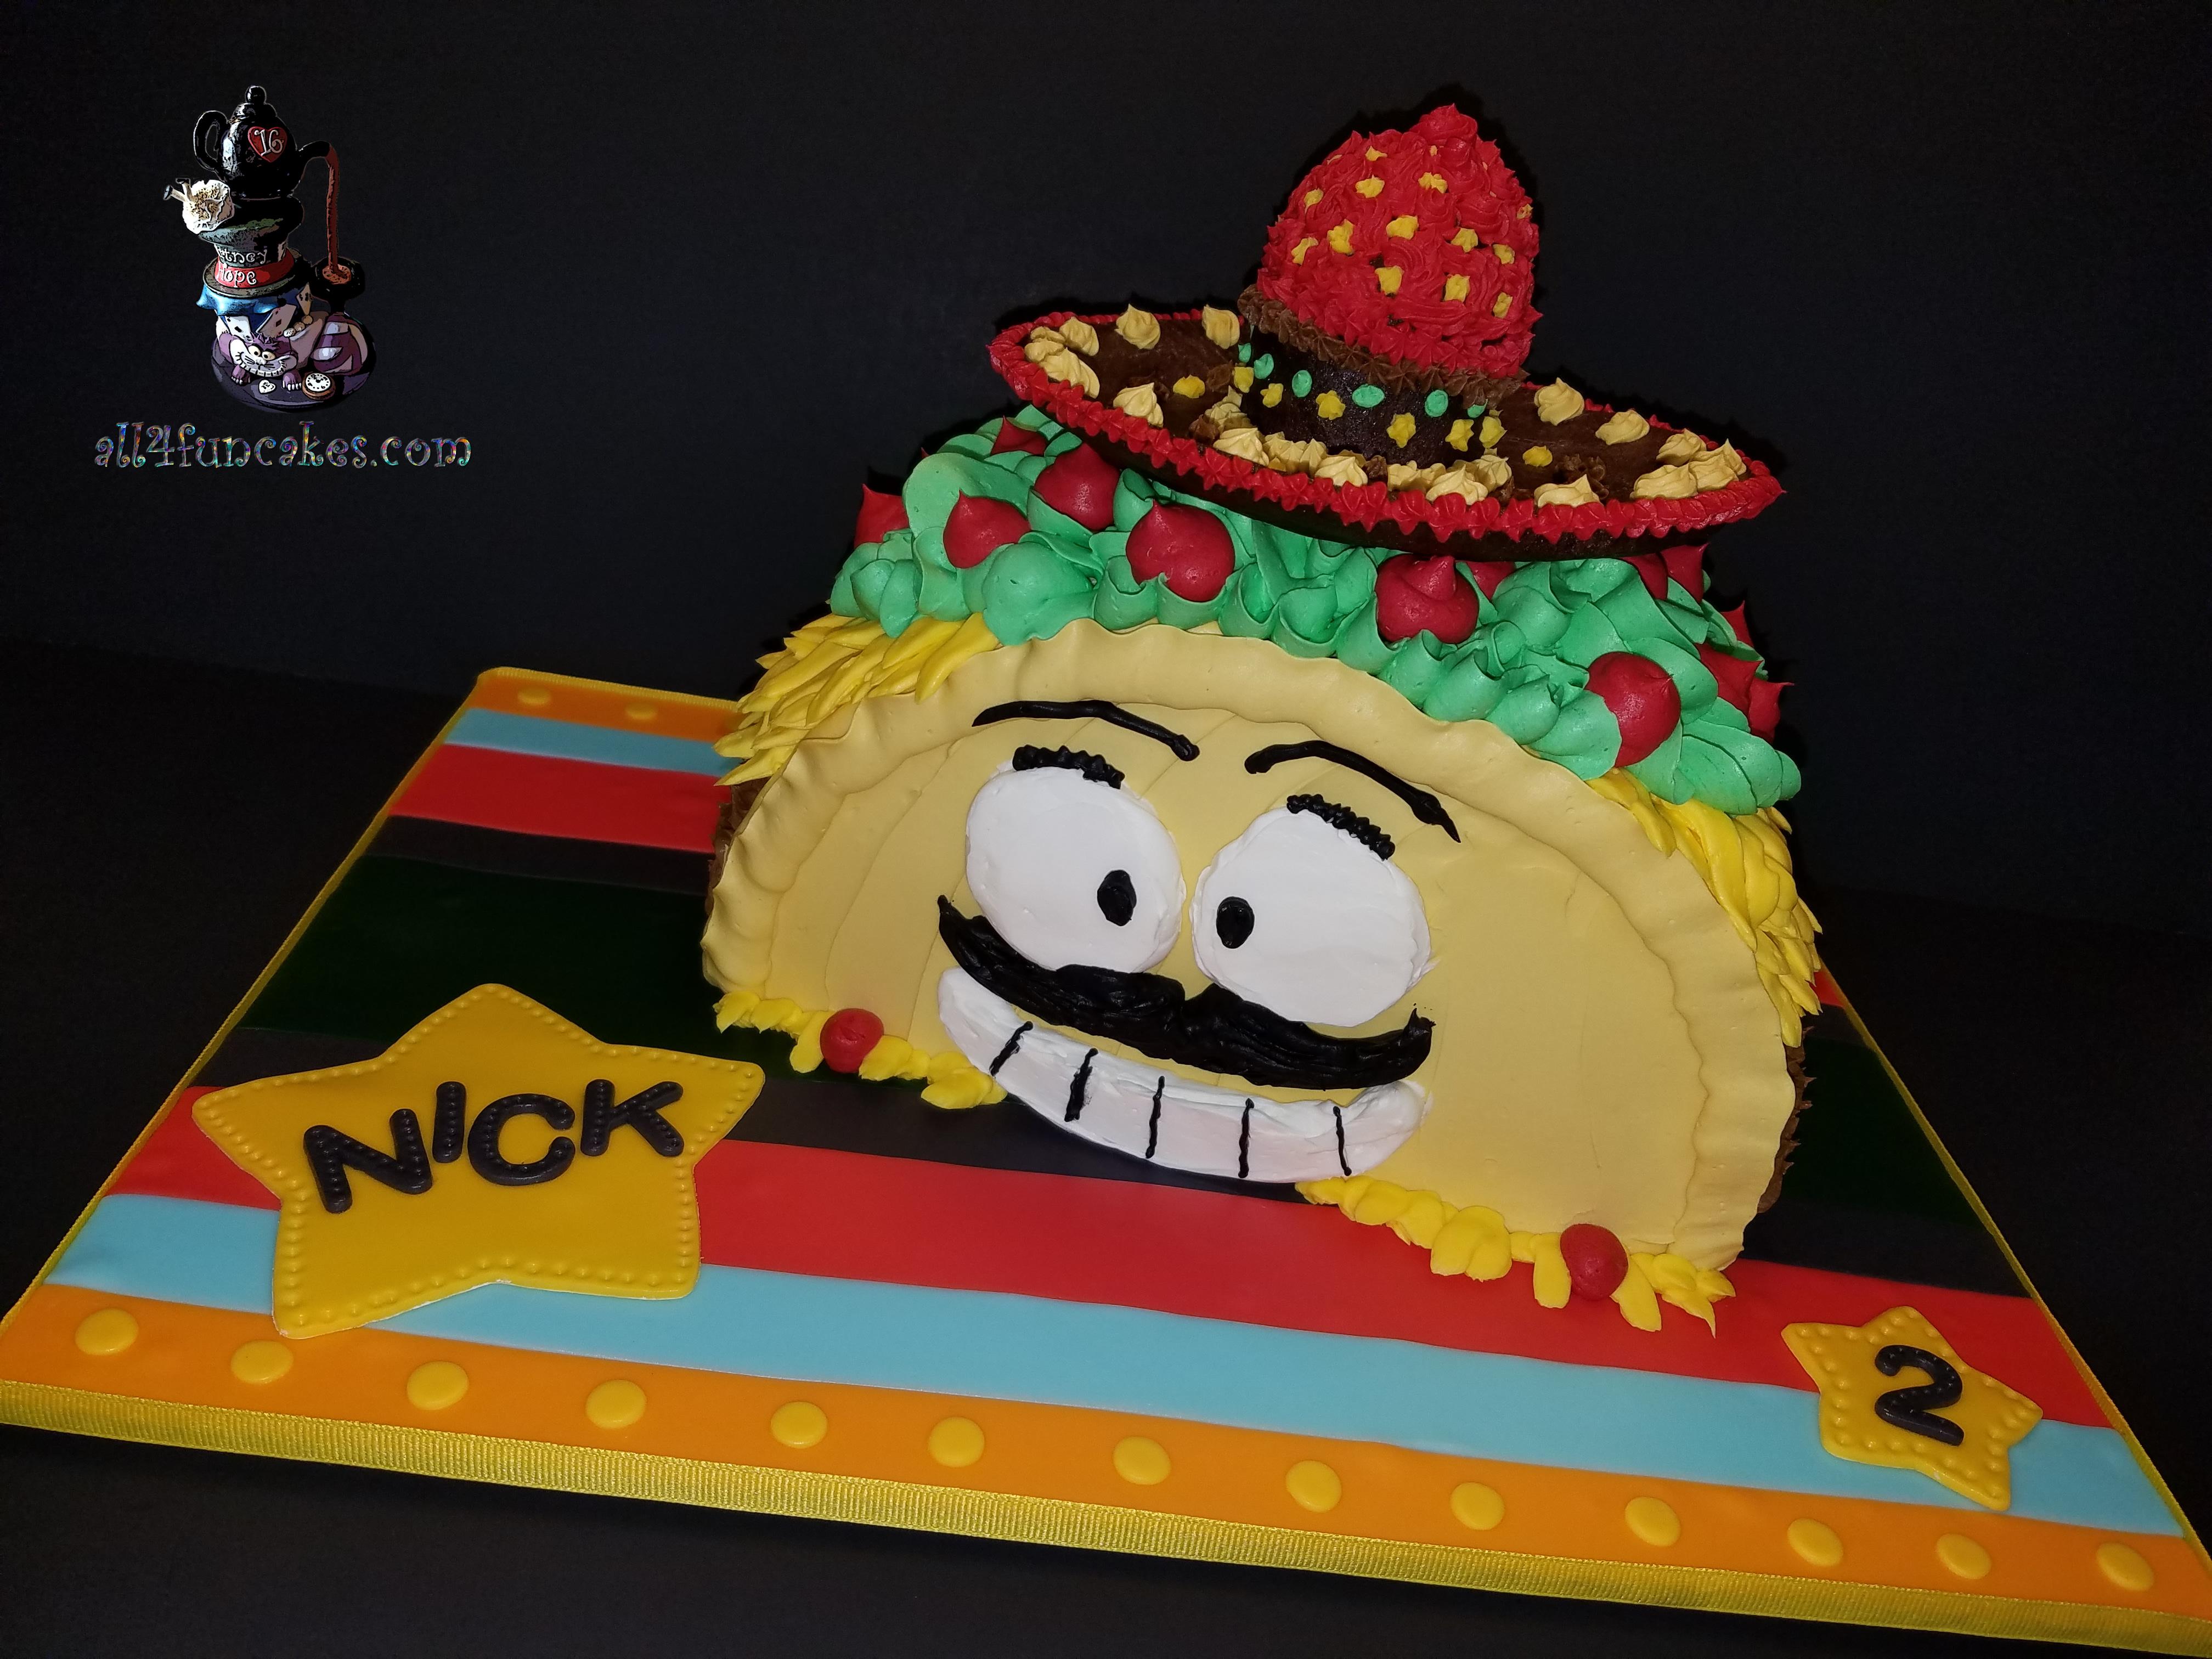 Mr Taco Loco Sculpted Smash Birthday Cake By All4fun Cakes Llc 2017